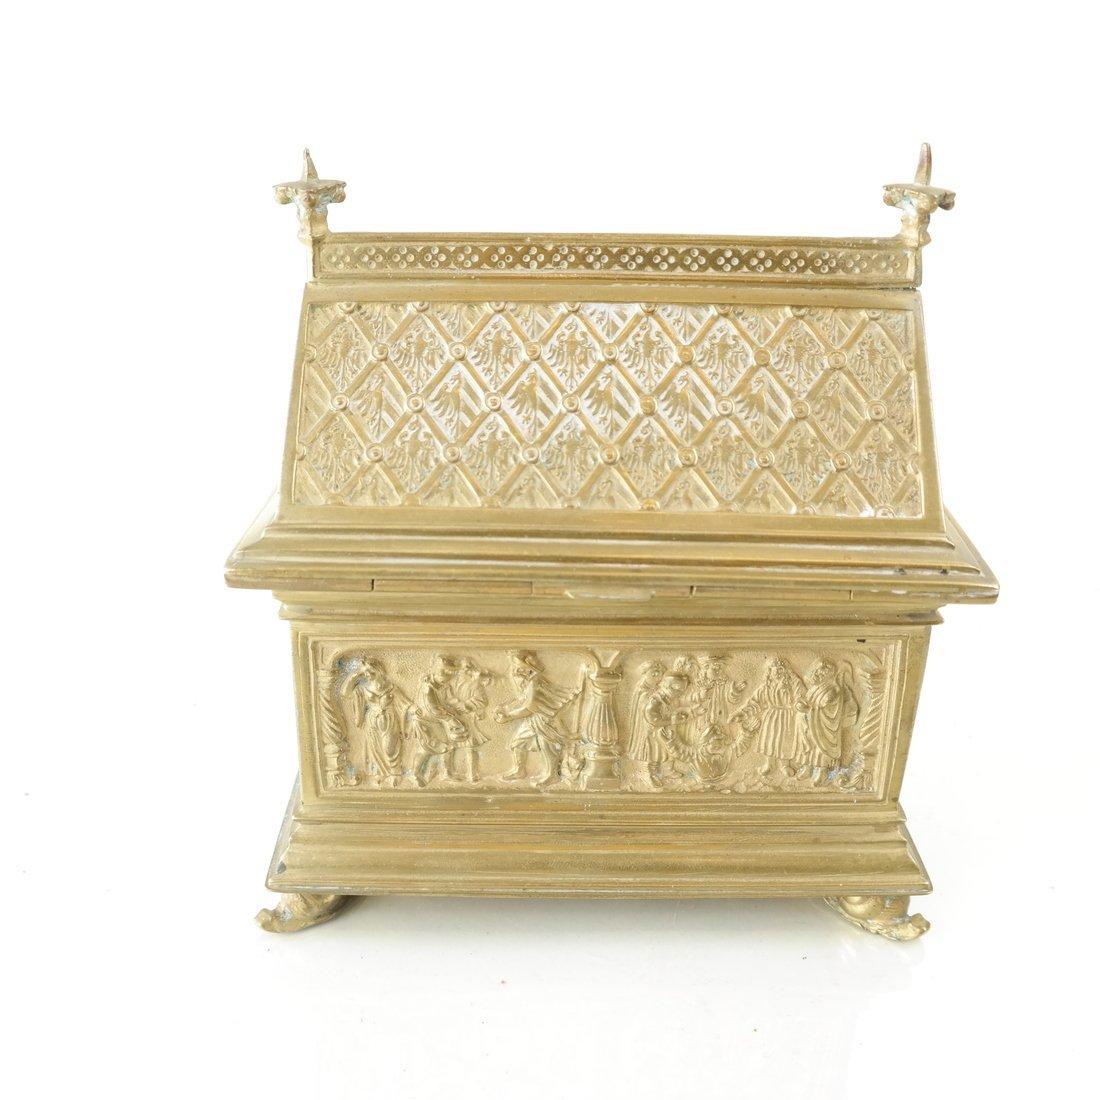 Ornate Casket Form Box - 5